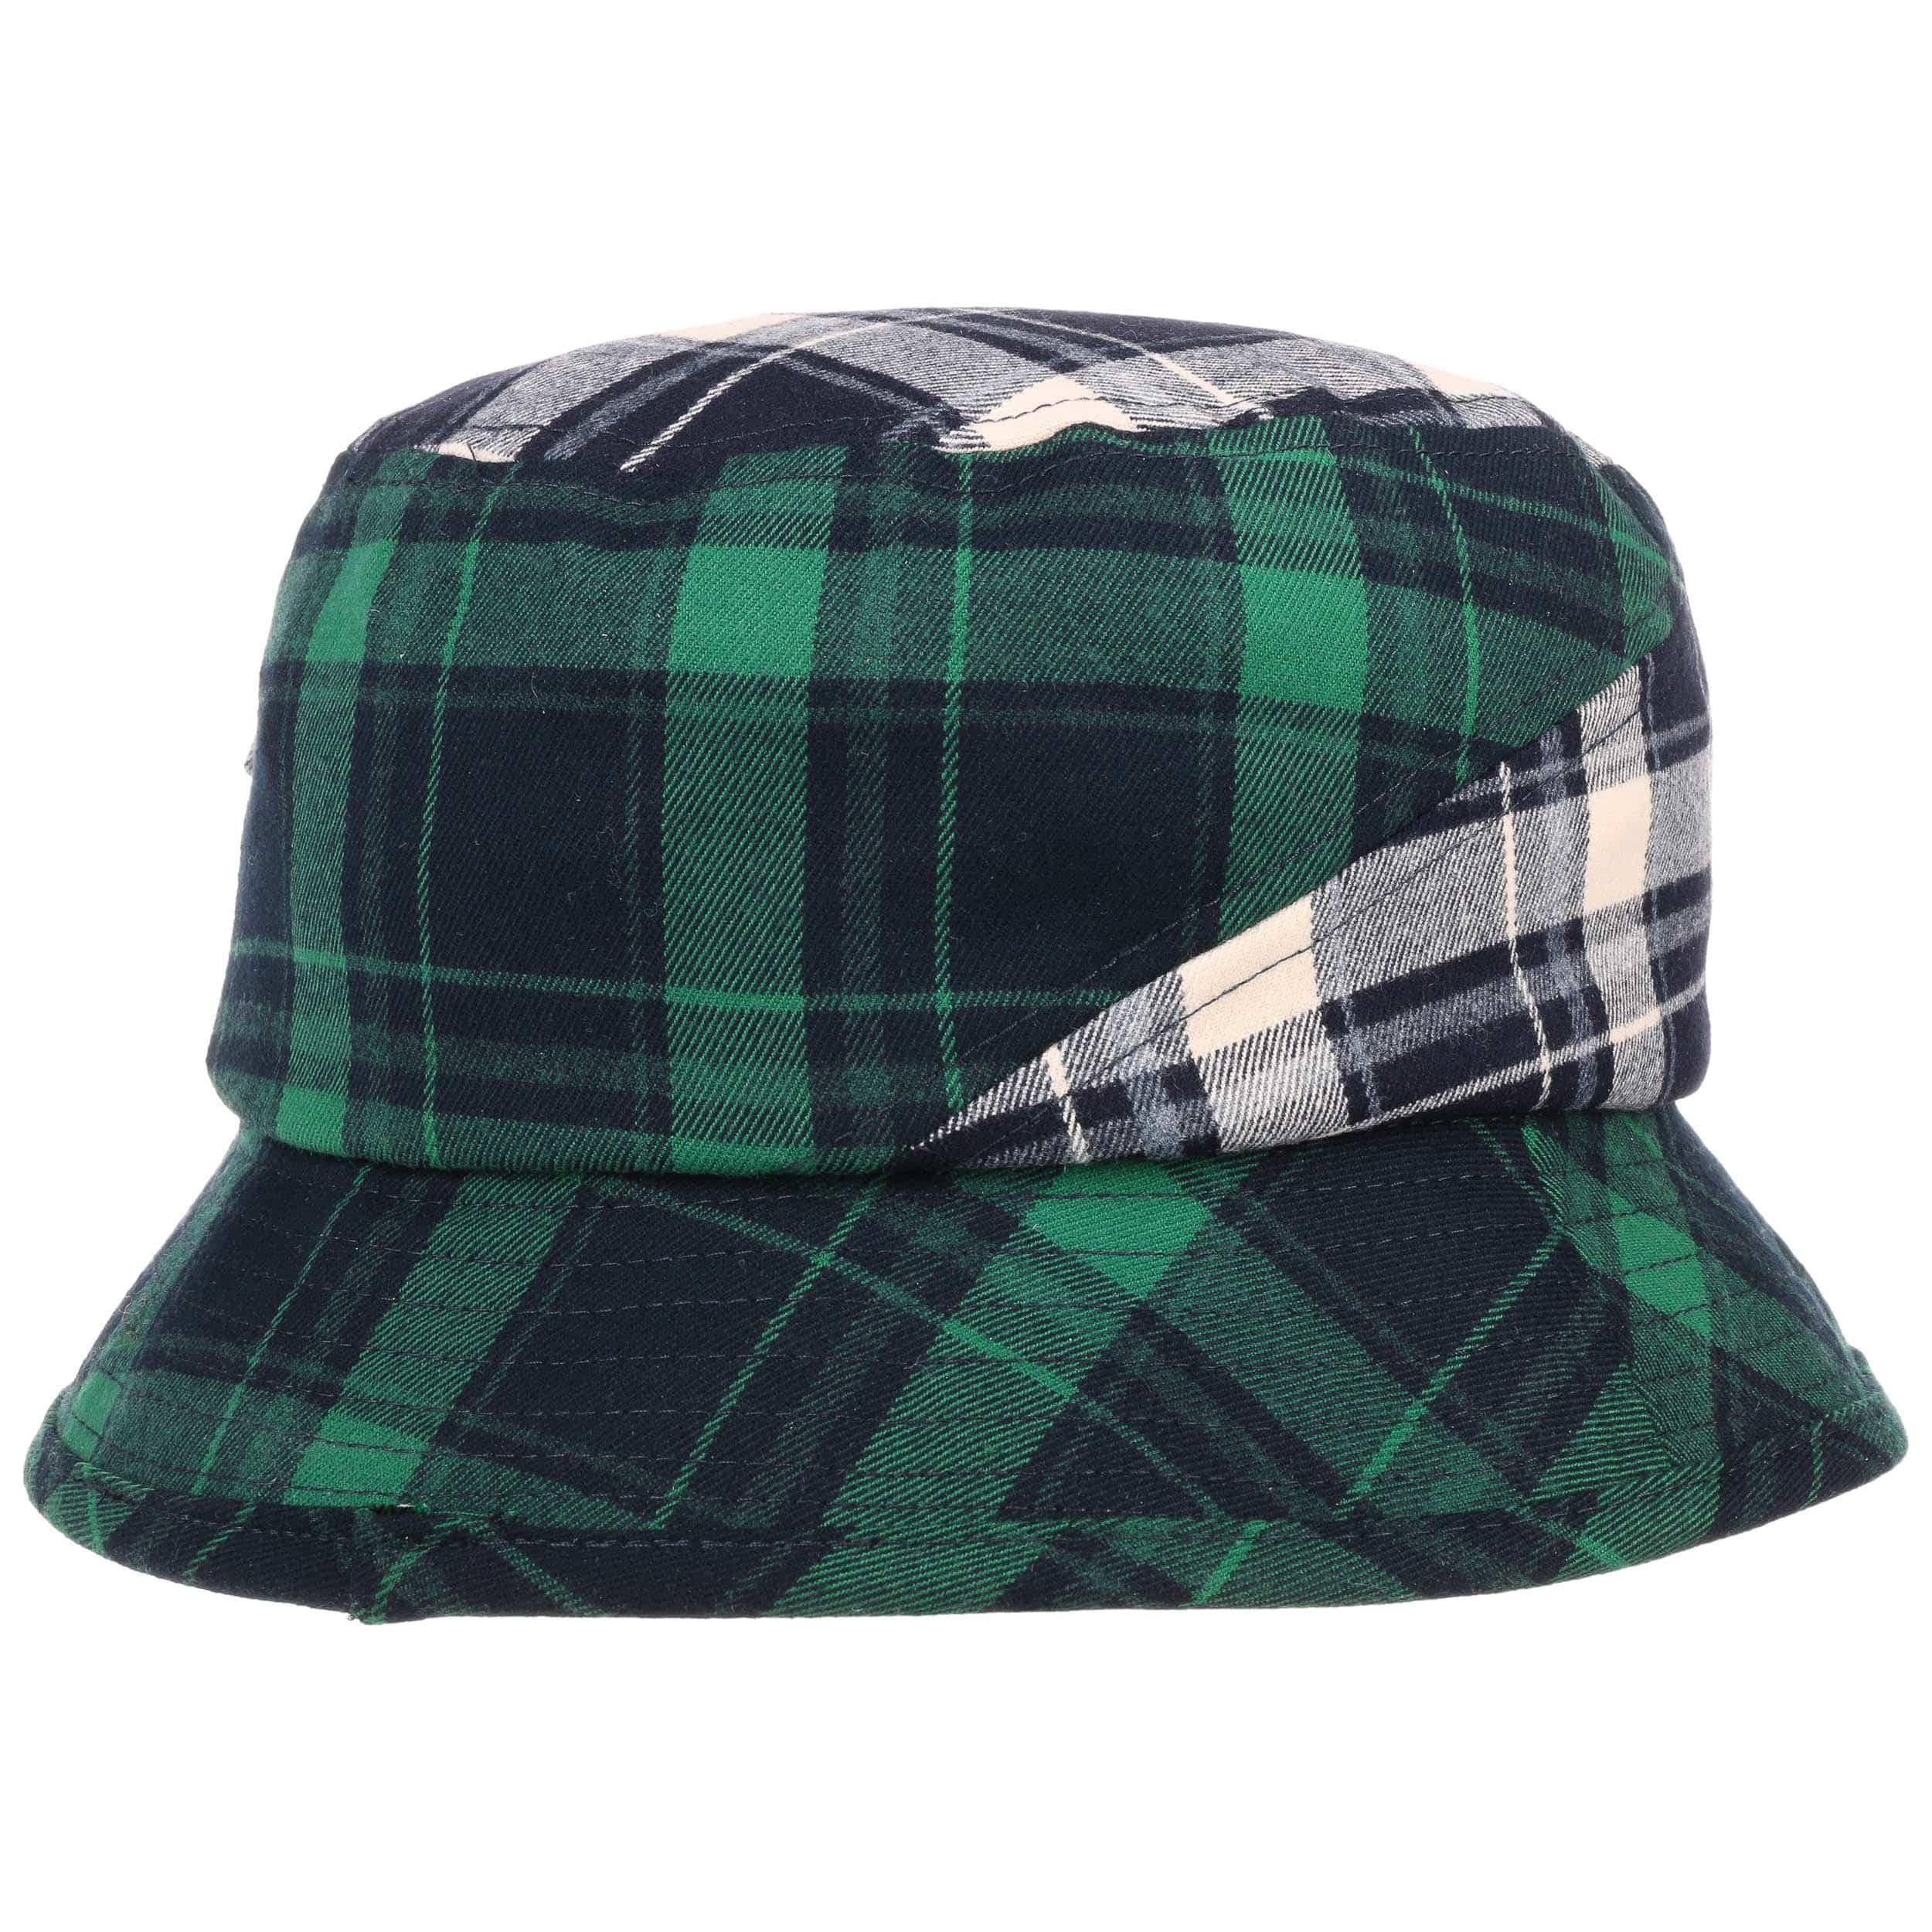 c05d2ff2937a21 ... Plaid on Plaid Bucket Hat by Kangol - blue-green 3 ...